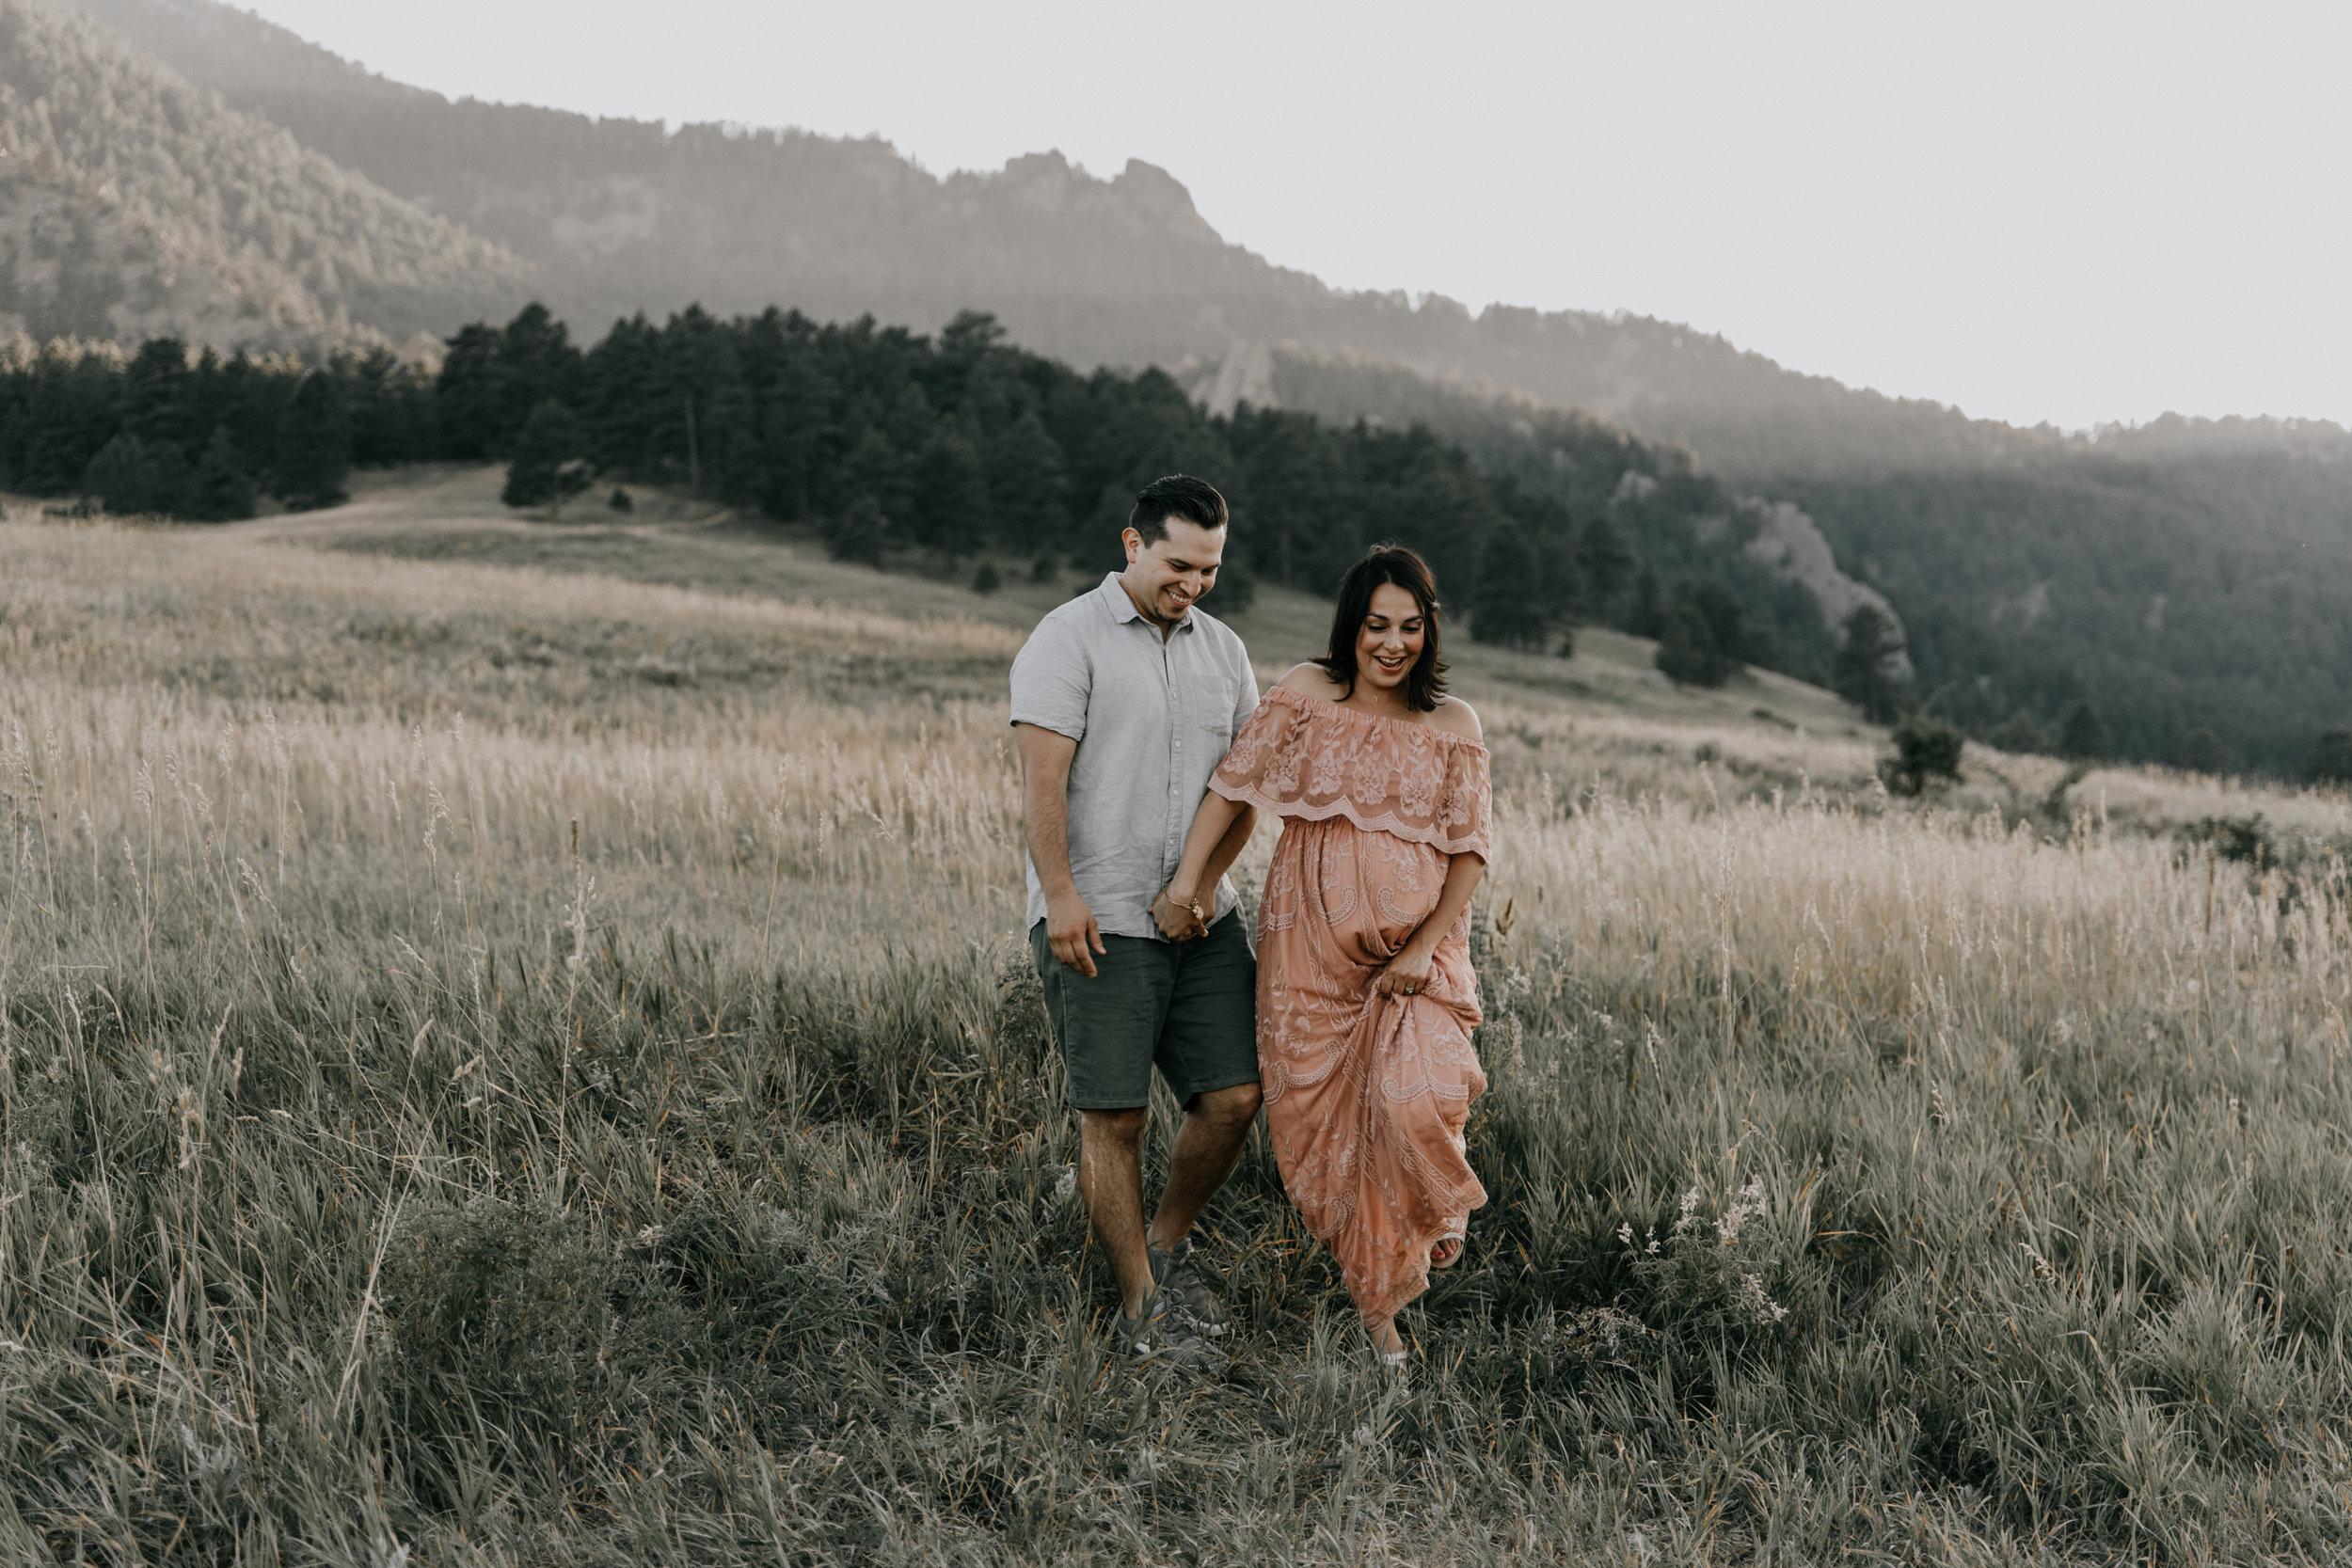 Coloradophotographer.jpg